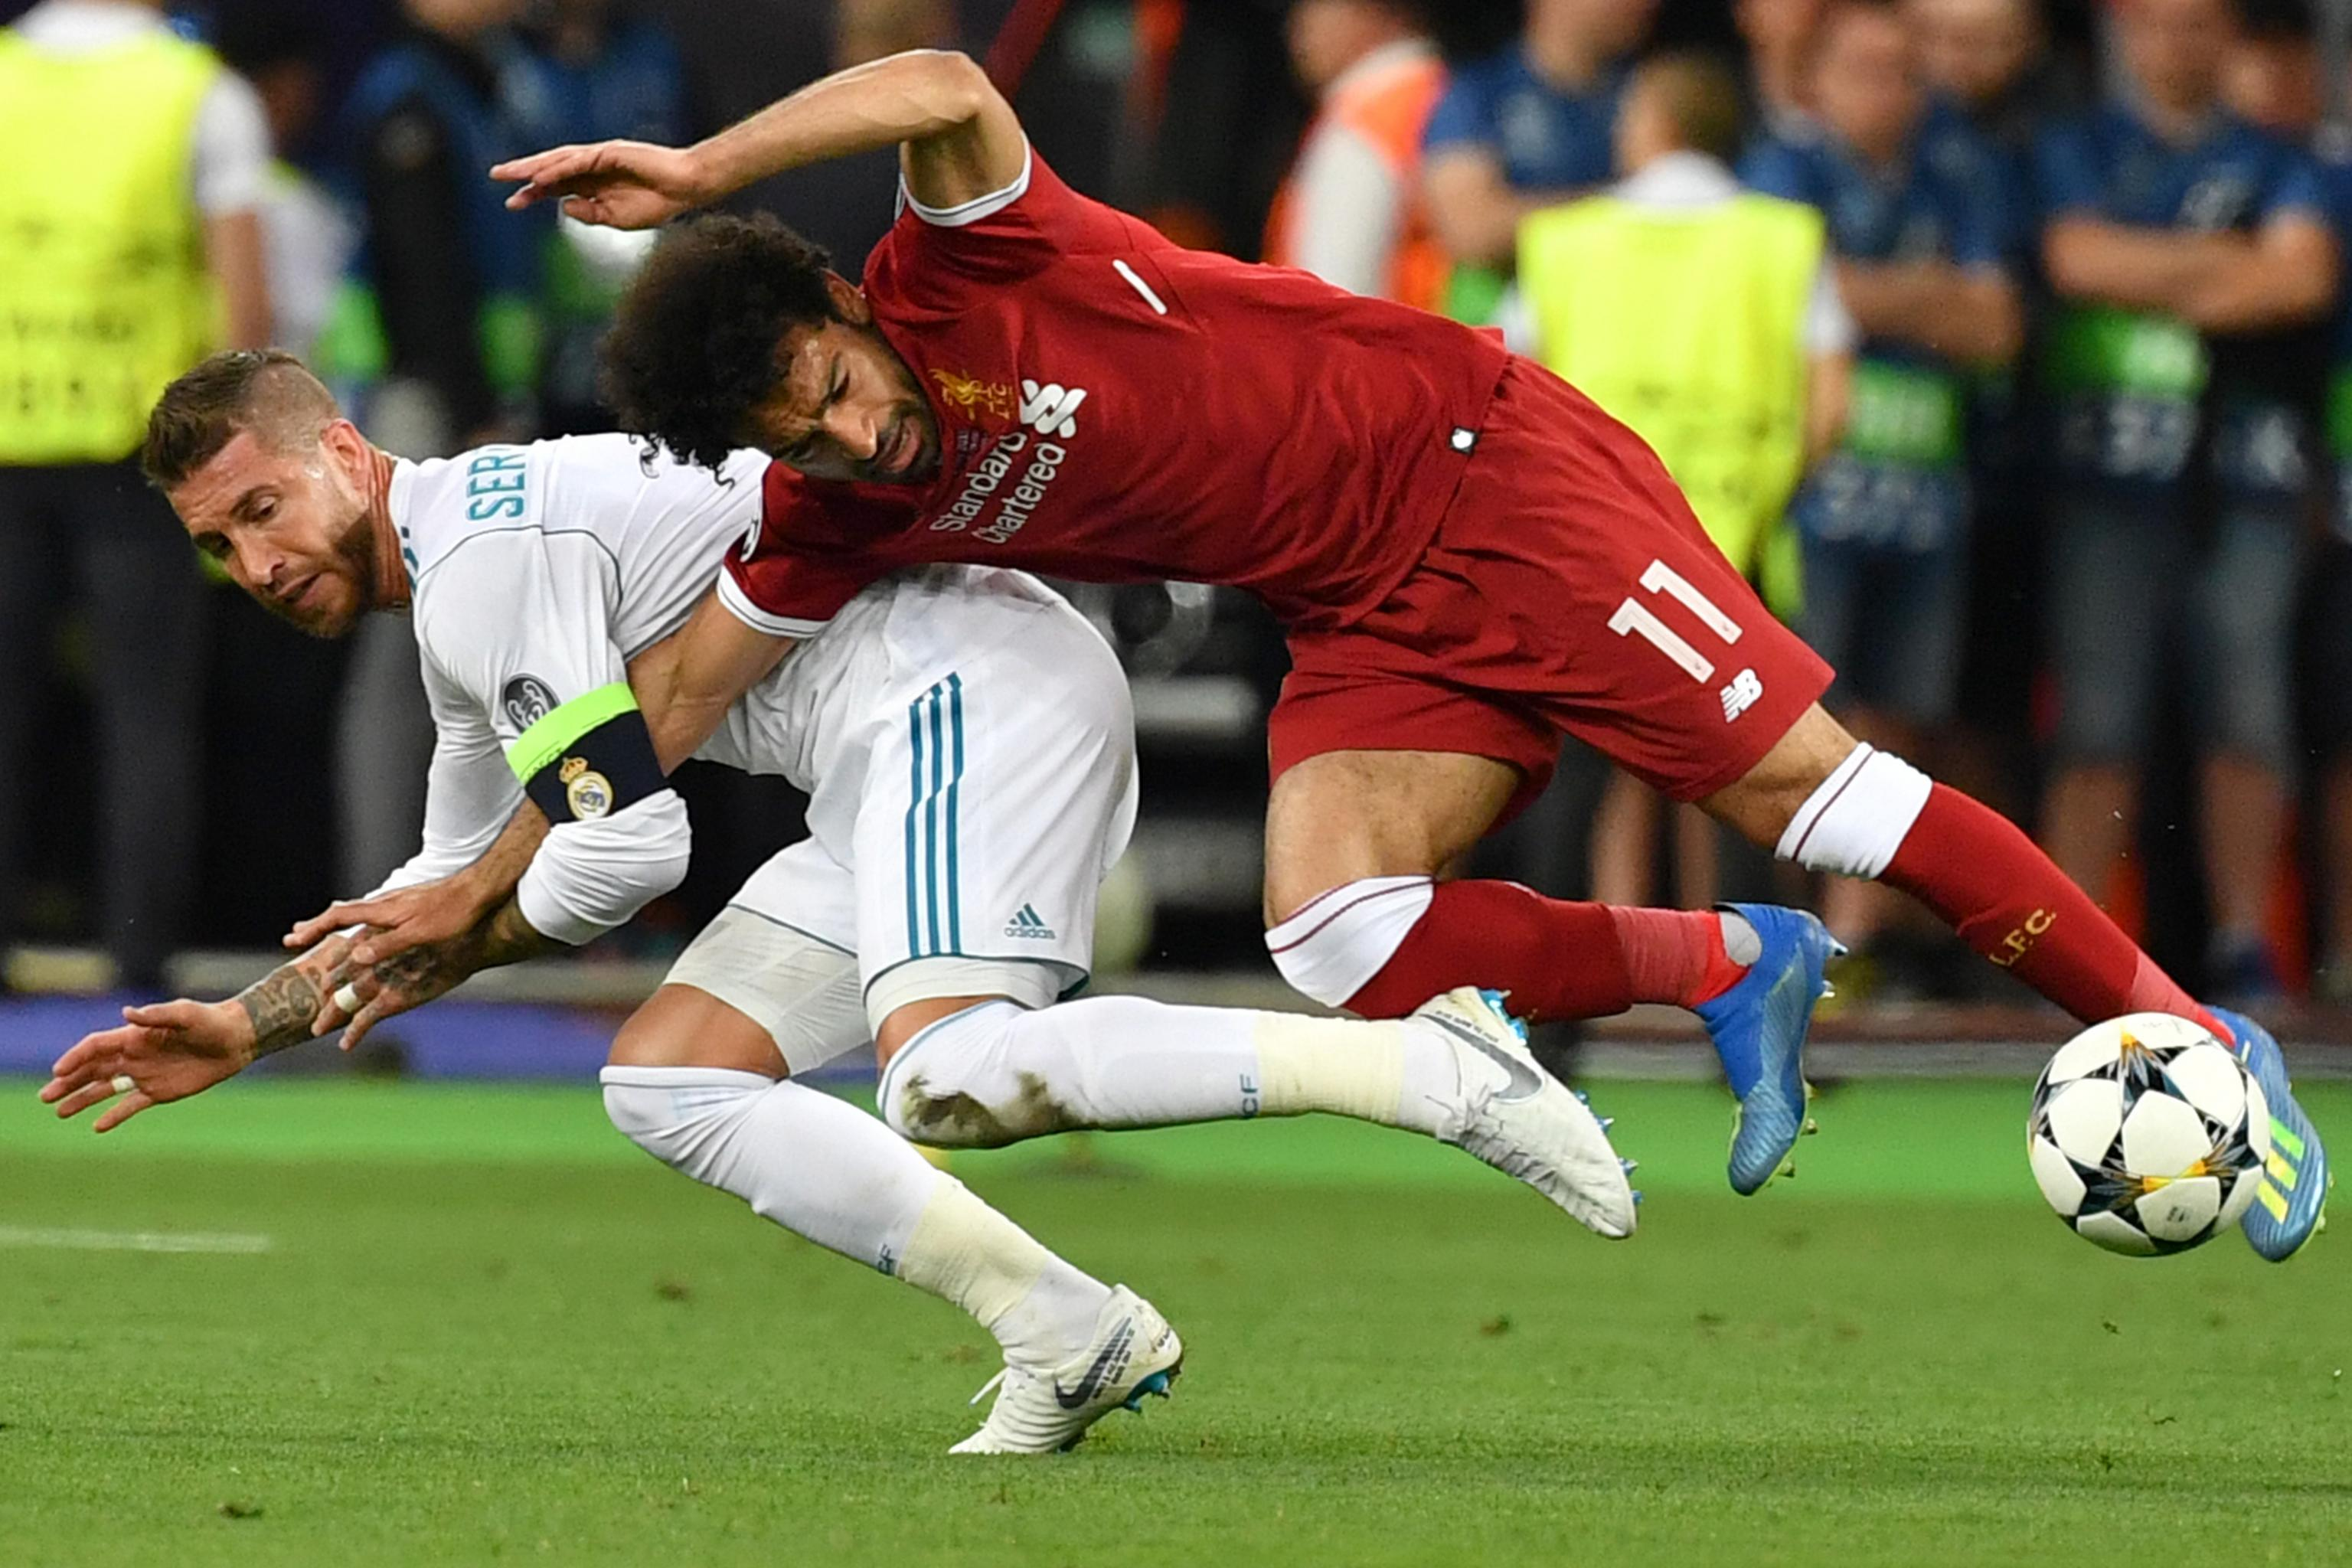 Sergio Ramos Calls Jurgen Klopp's Comments on Mo Salah Injury 'An Excuse' |  Bleacher Report | Latest News, Videos and Highlights